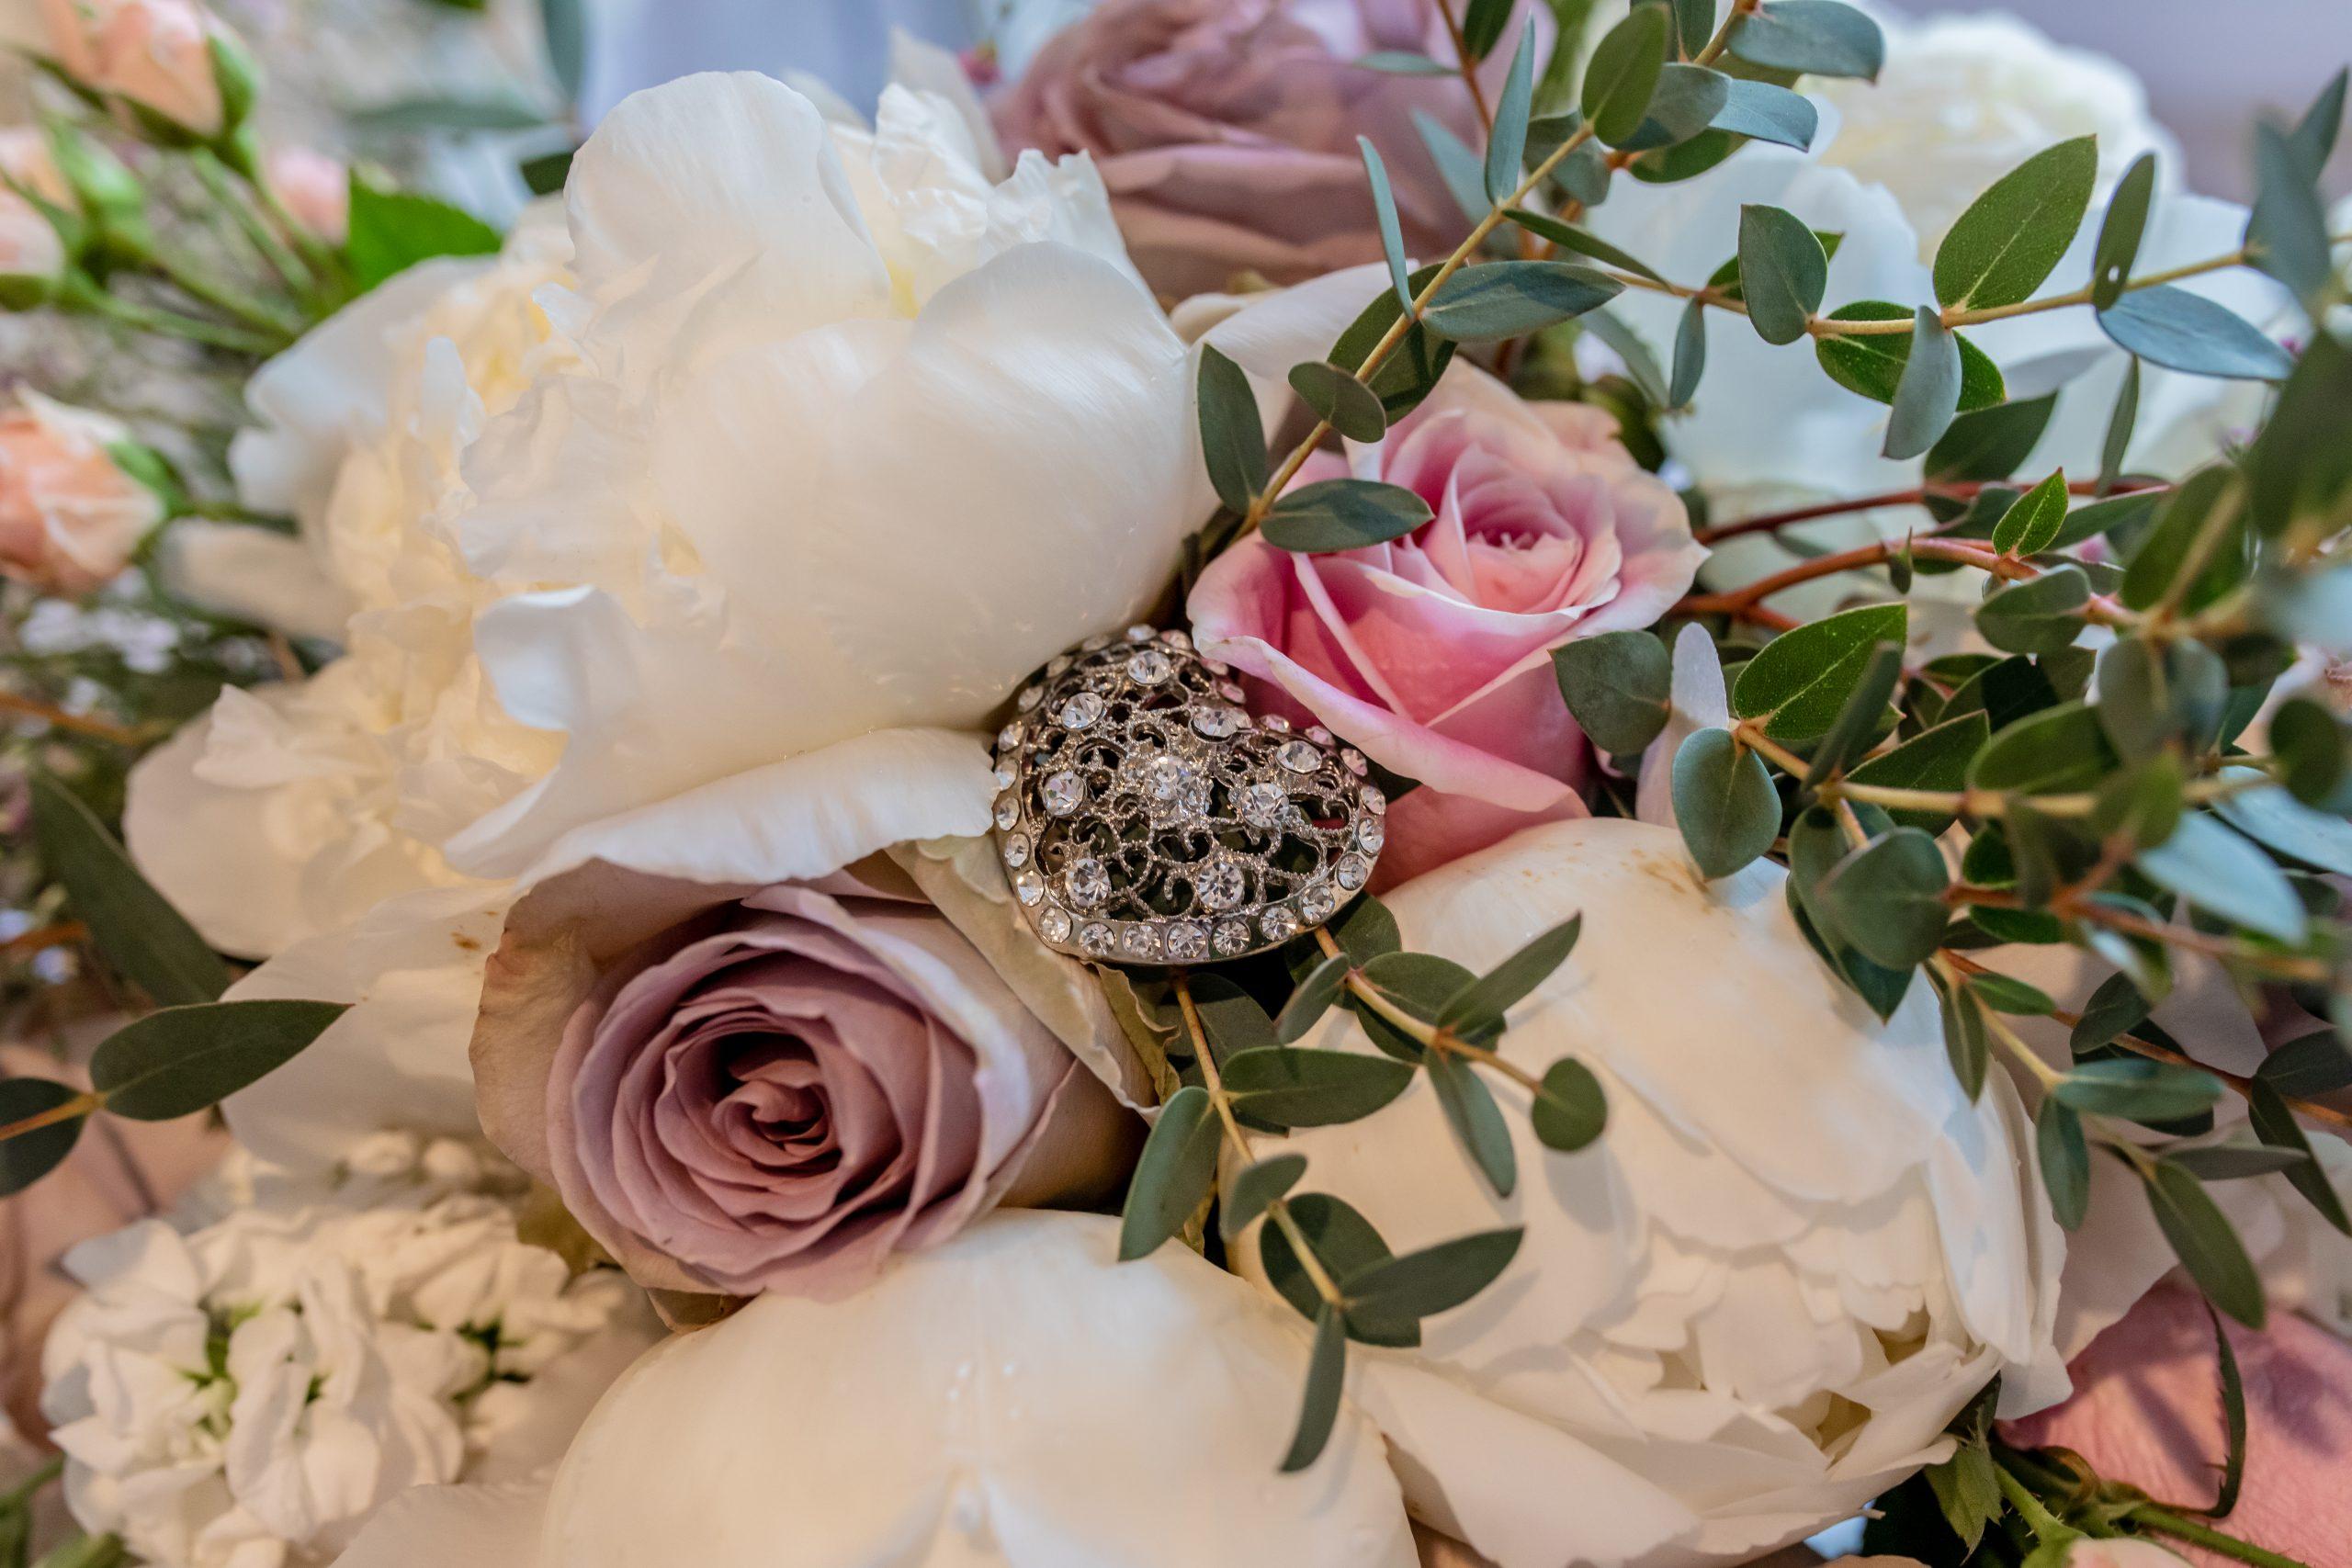 Wedding Flowers - Forest of Arden Hotel Chelsea & Harry Wedding 2021